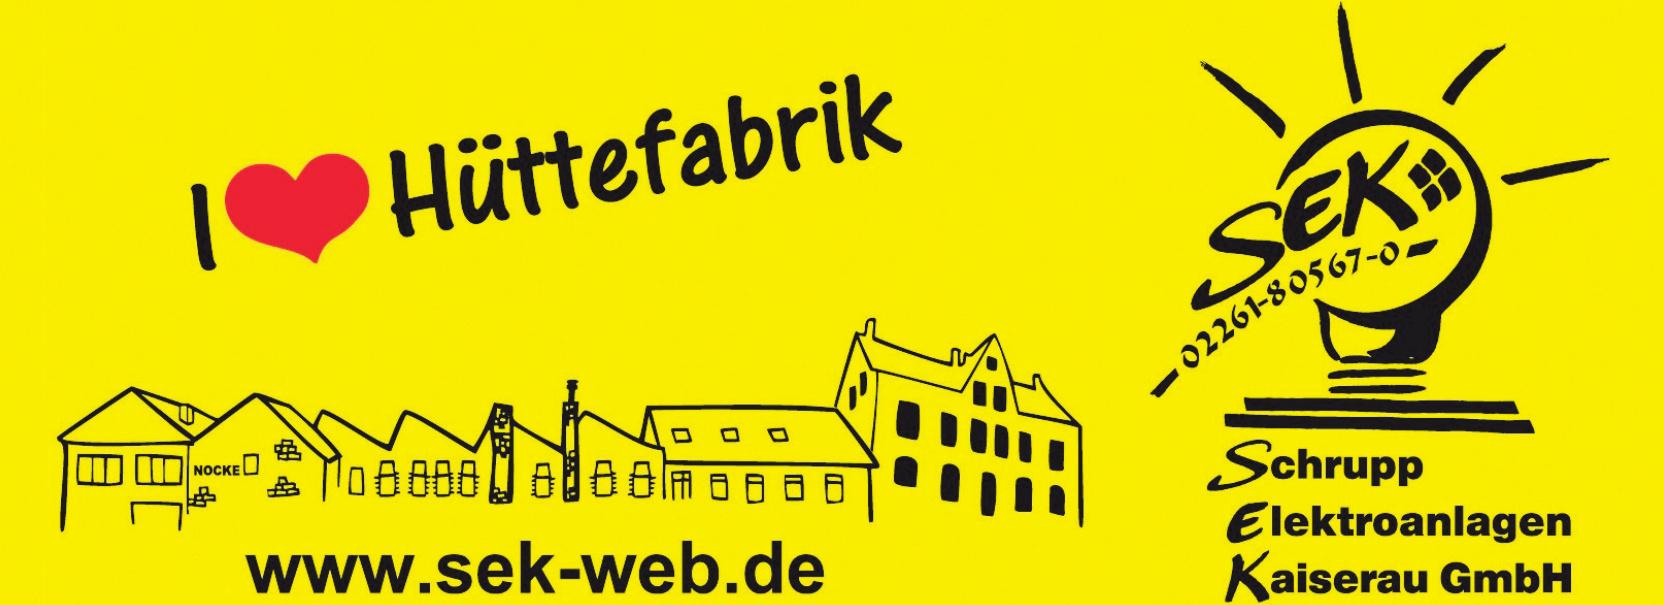 SEK Schrupp Elektroanlagen Kaiserau GmbH